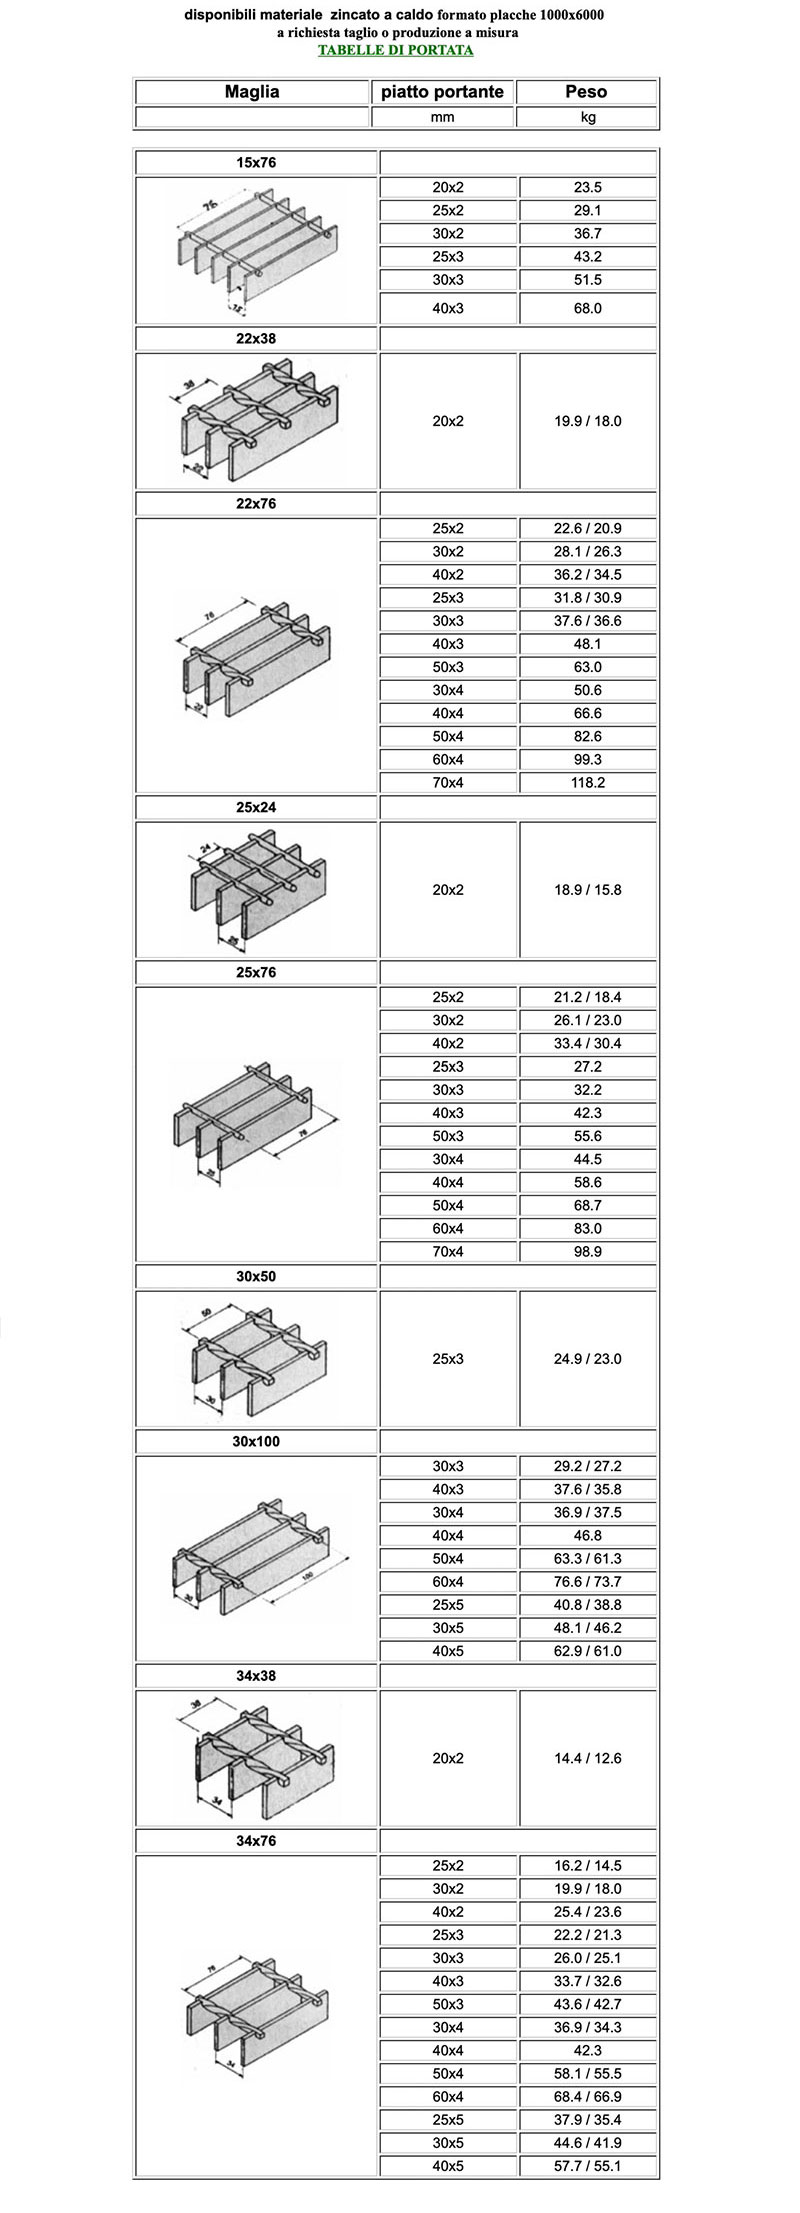 tabella misure dei grigliati di Vicini Tubi spa Firenze